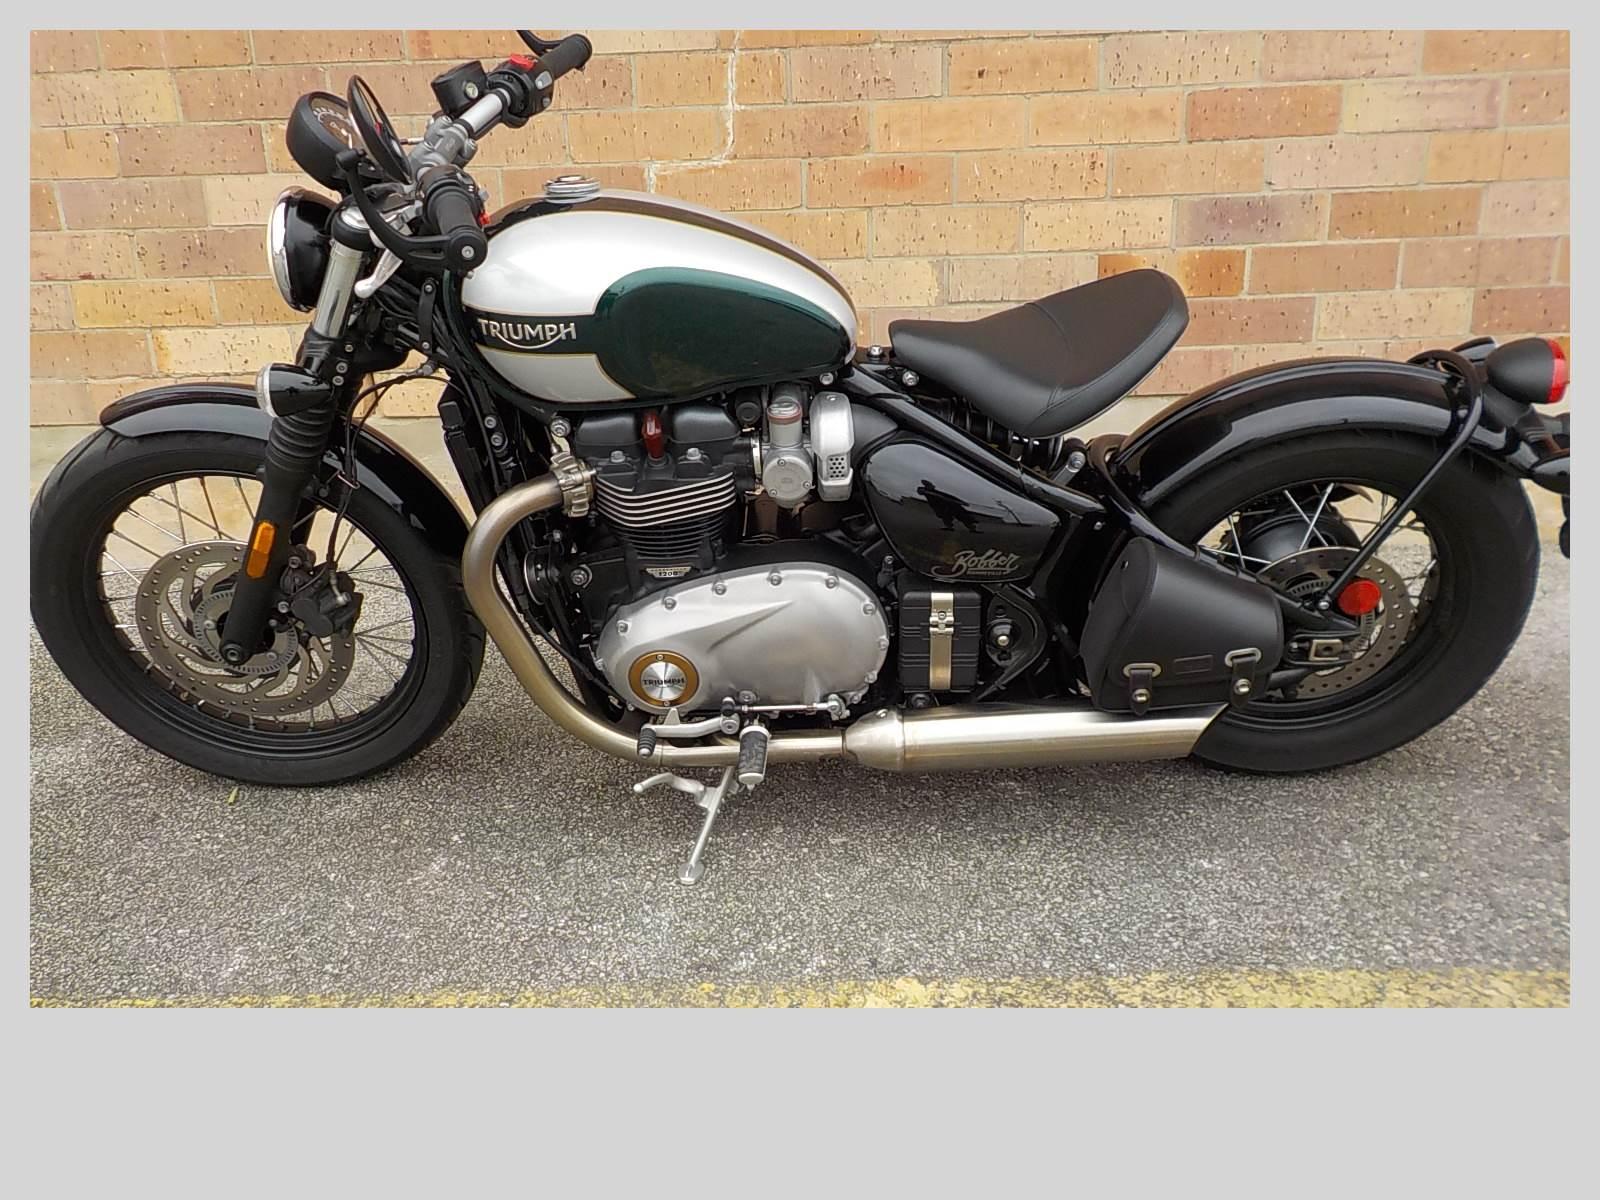 Used 2017 Triumph Bonneville Bobber Motorcycles in San Antonio, TX